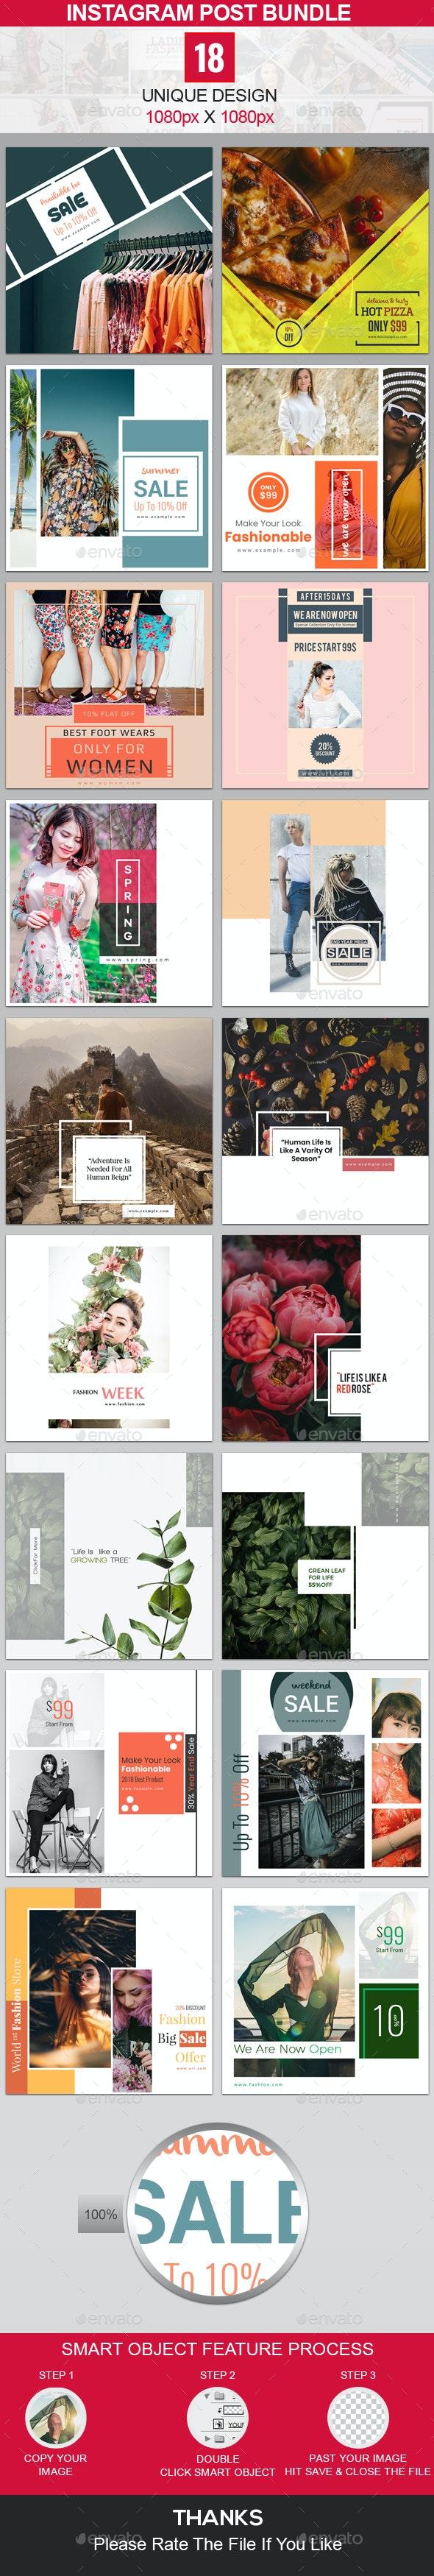 Instagram Post Bundle - 18 Design - Miscellaneous Social Media